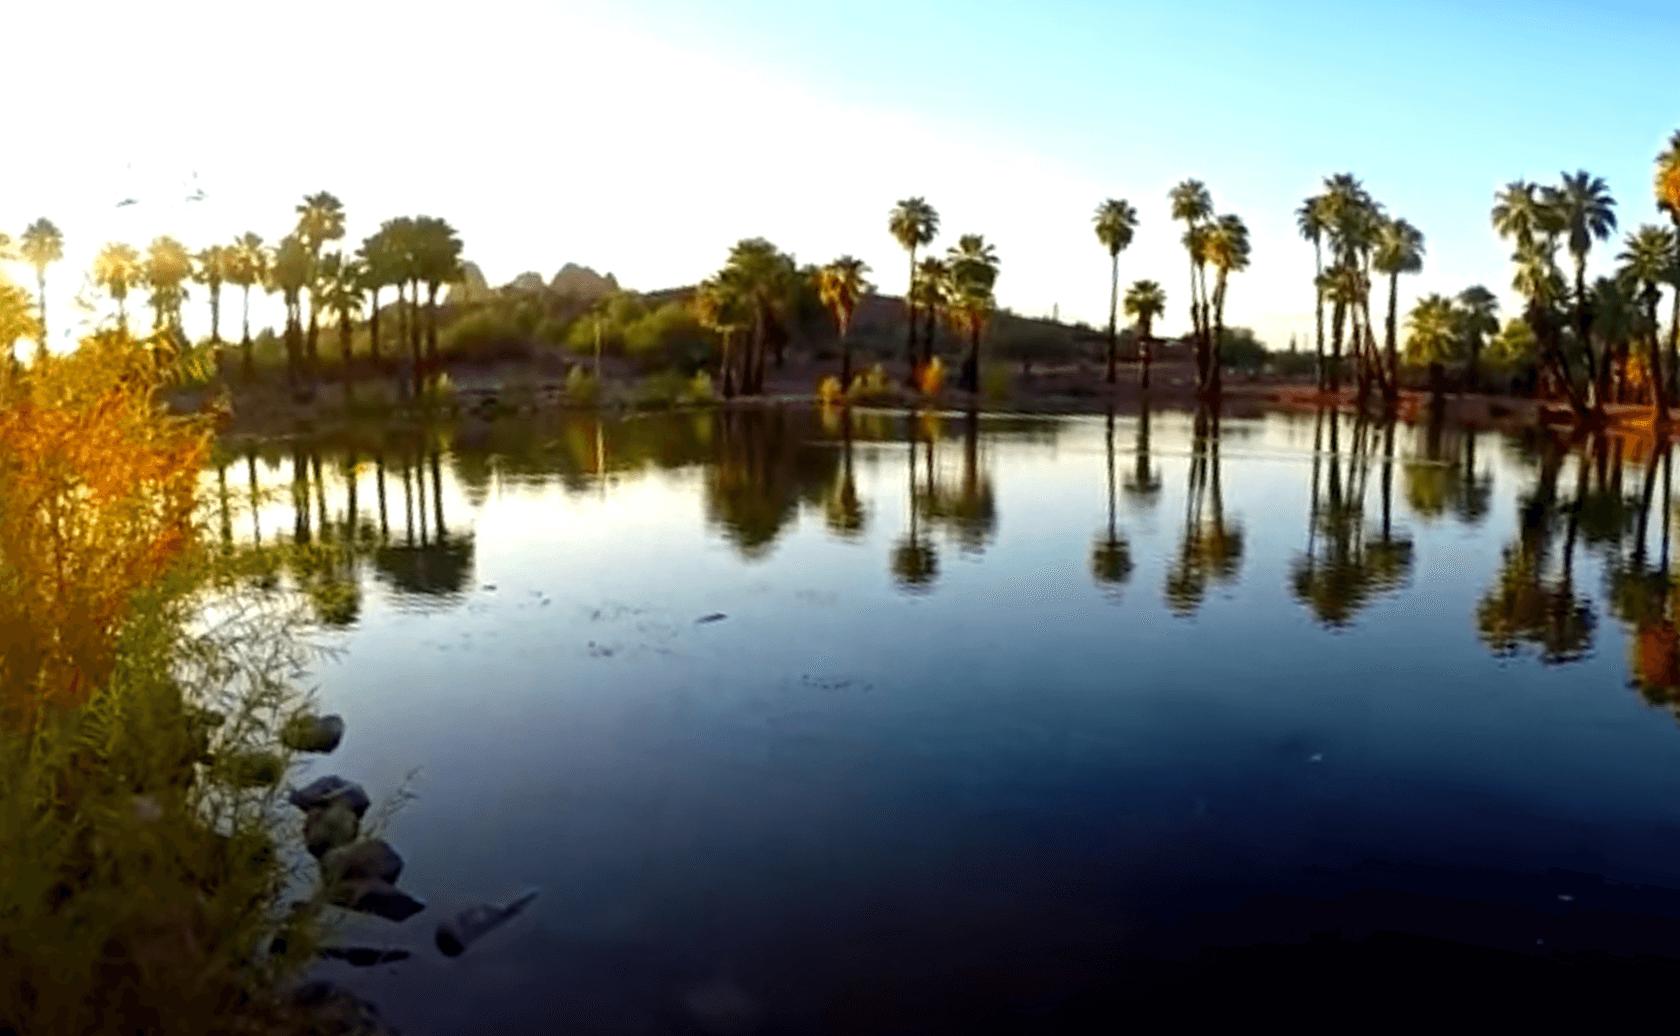 Evelyn-Hallman-Pond-Lake-Fishing-Guide-Tempe-AZ-04